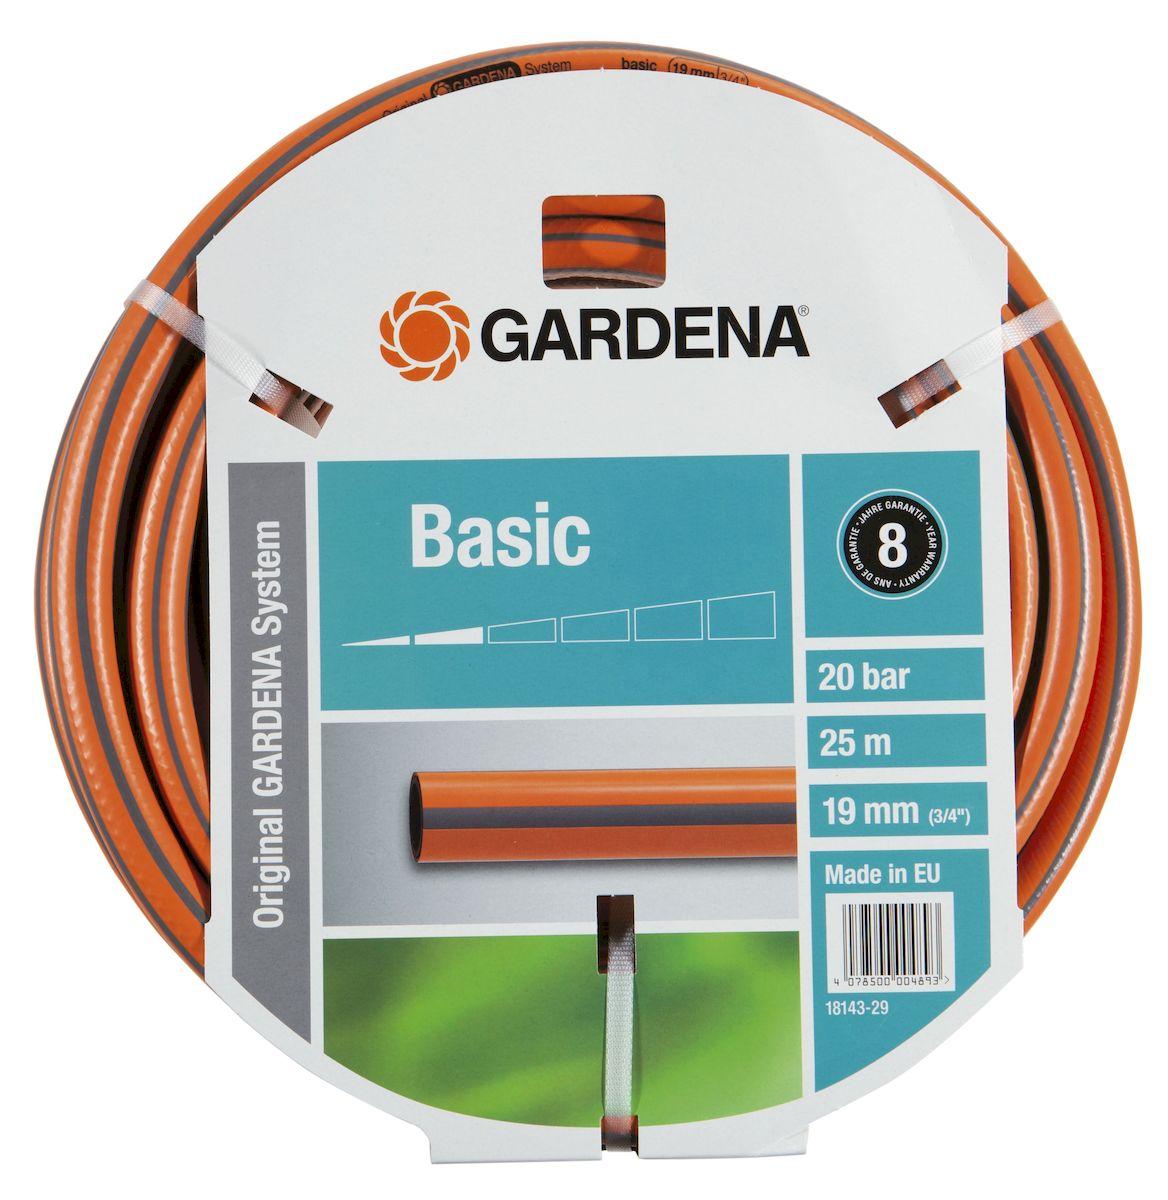 Шланг Gardena Basic, 19 мм (3/4) х 25 м шланг подающий gardena 3 16 4 6мм 50м 01348 20 000 00